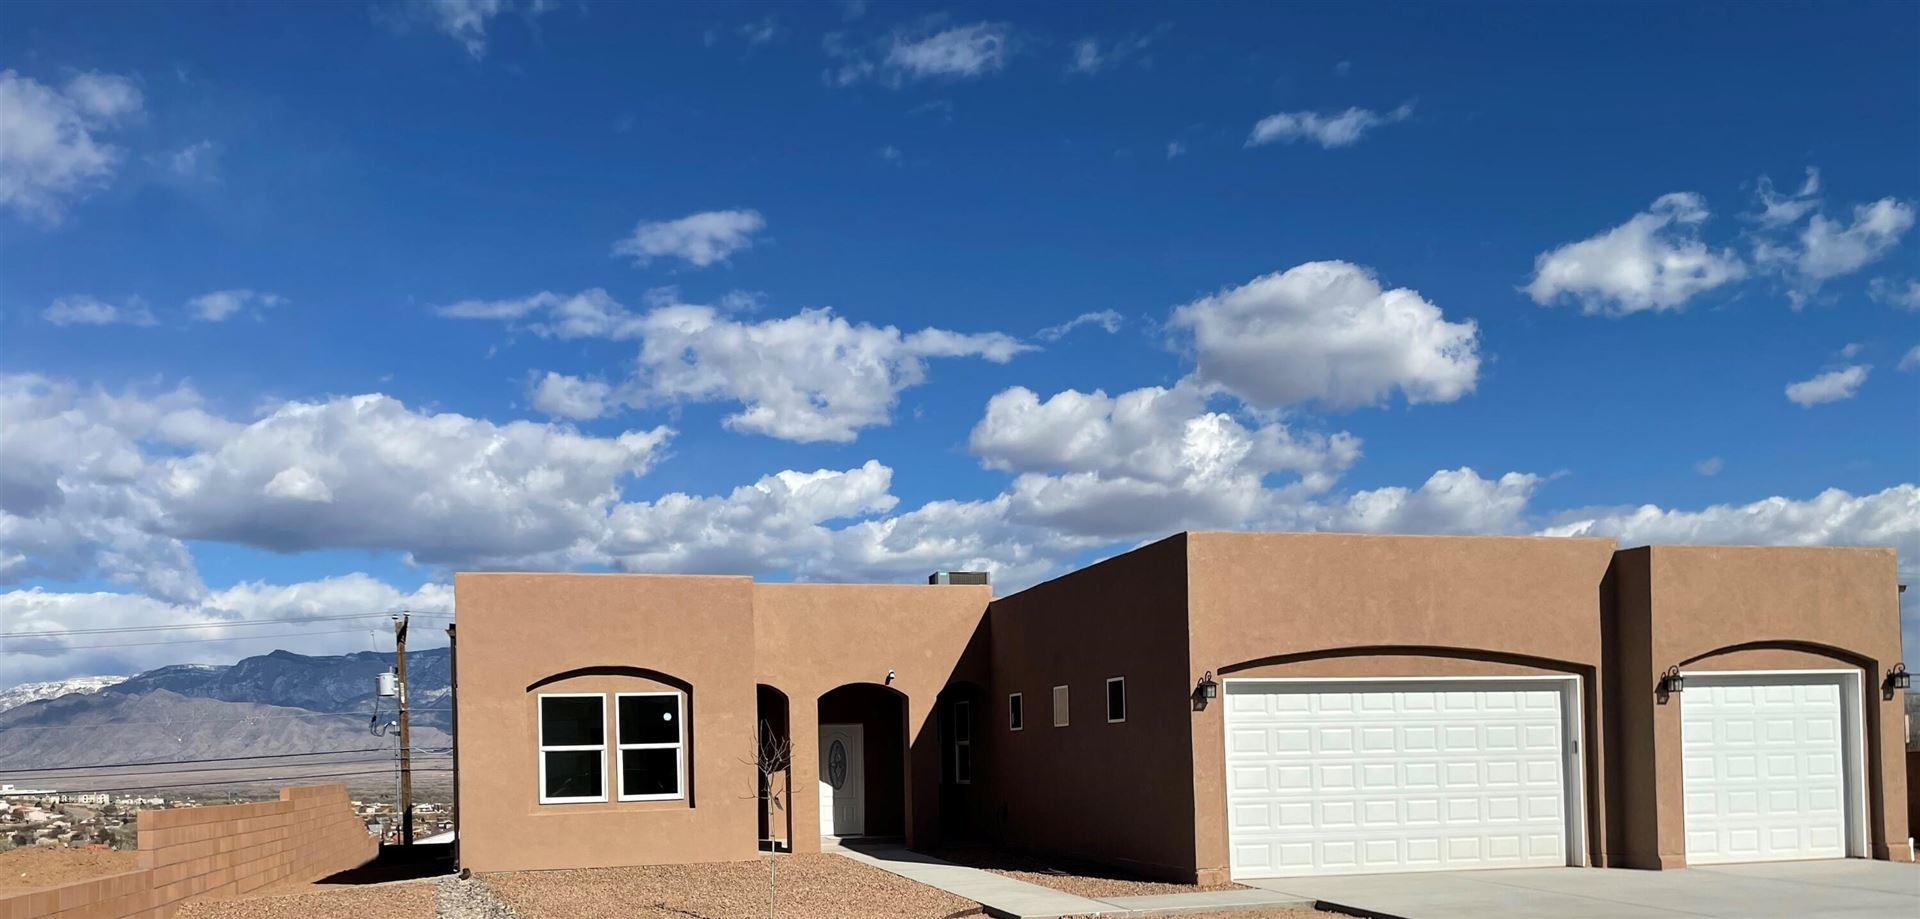 10512 Redbud Street NW, Albuquerque, NM 87114 - MLS#: 985632